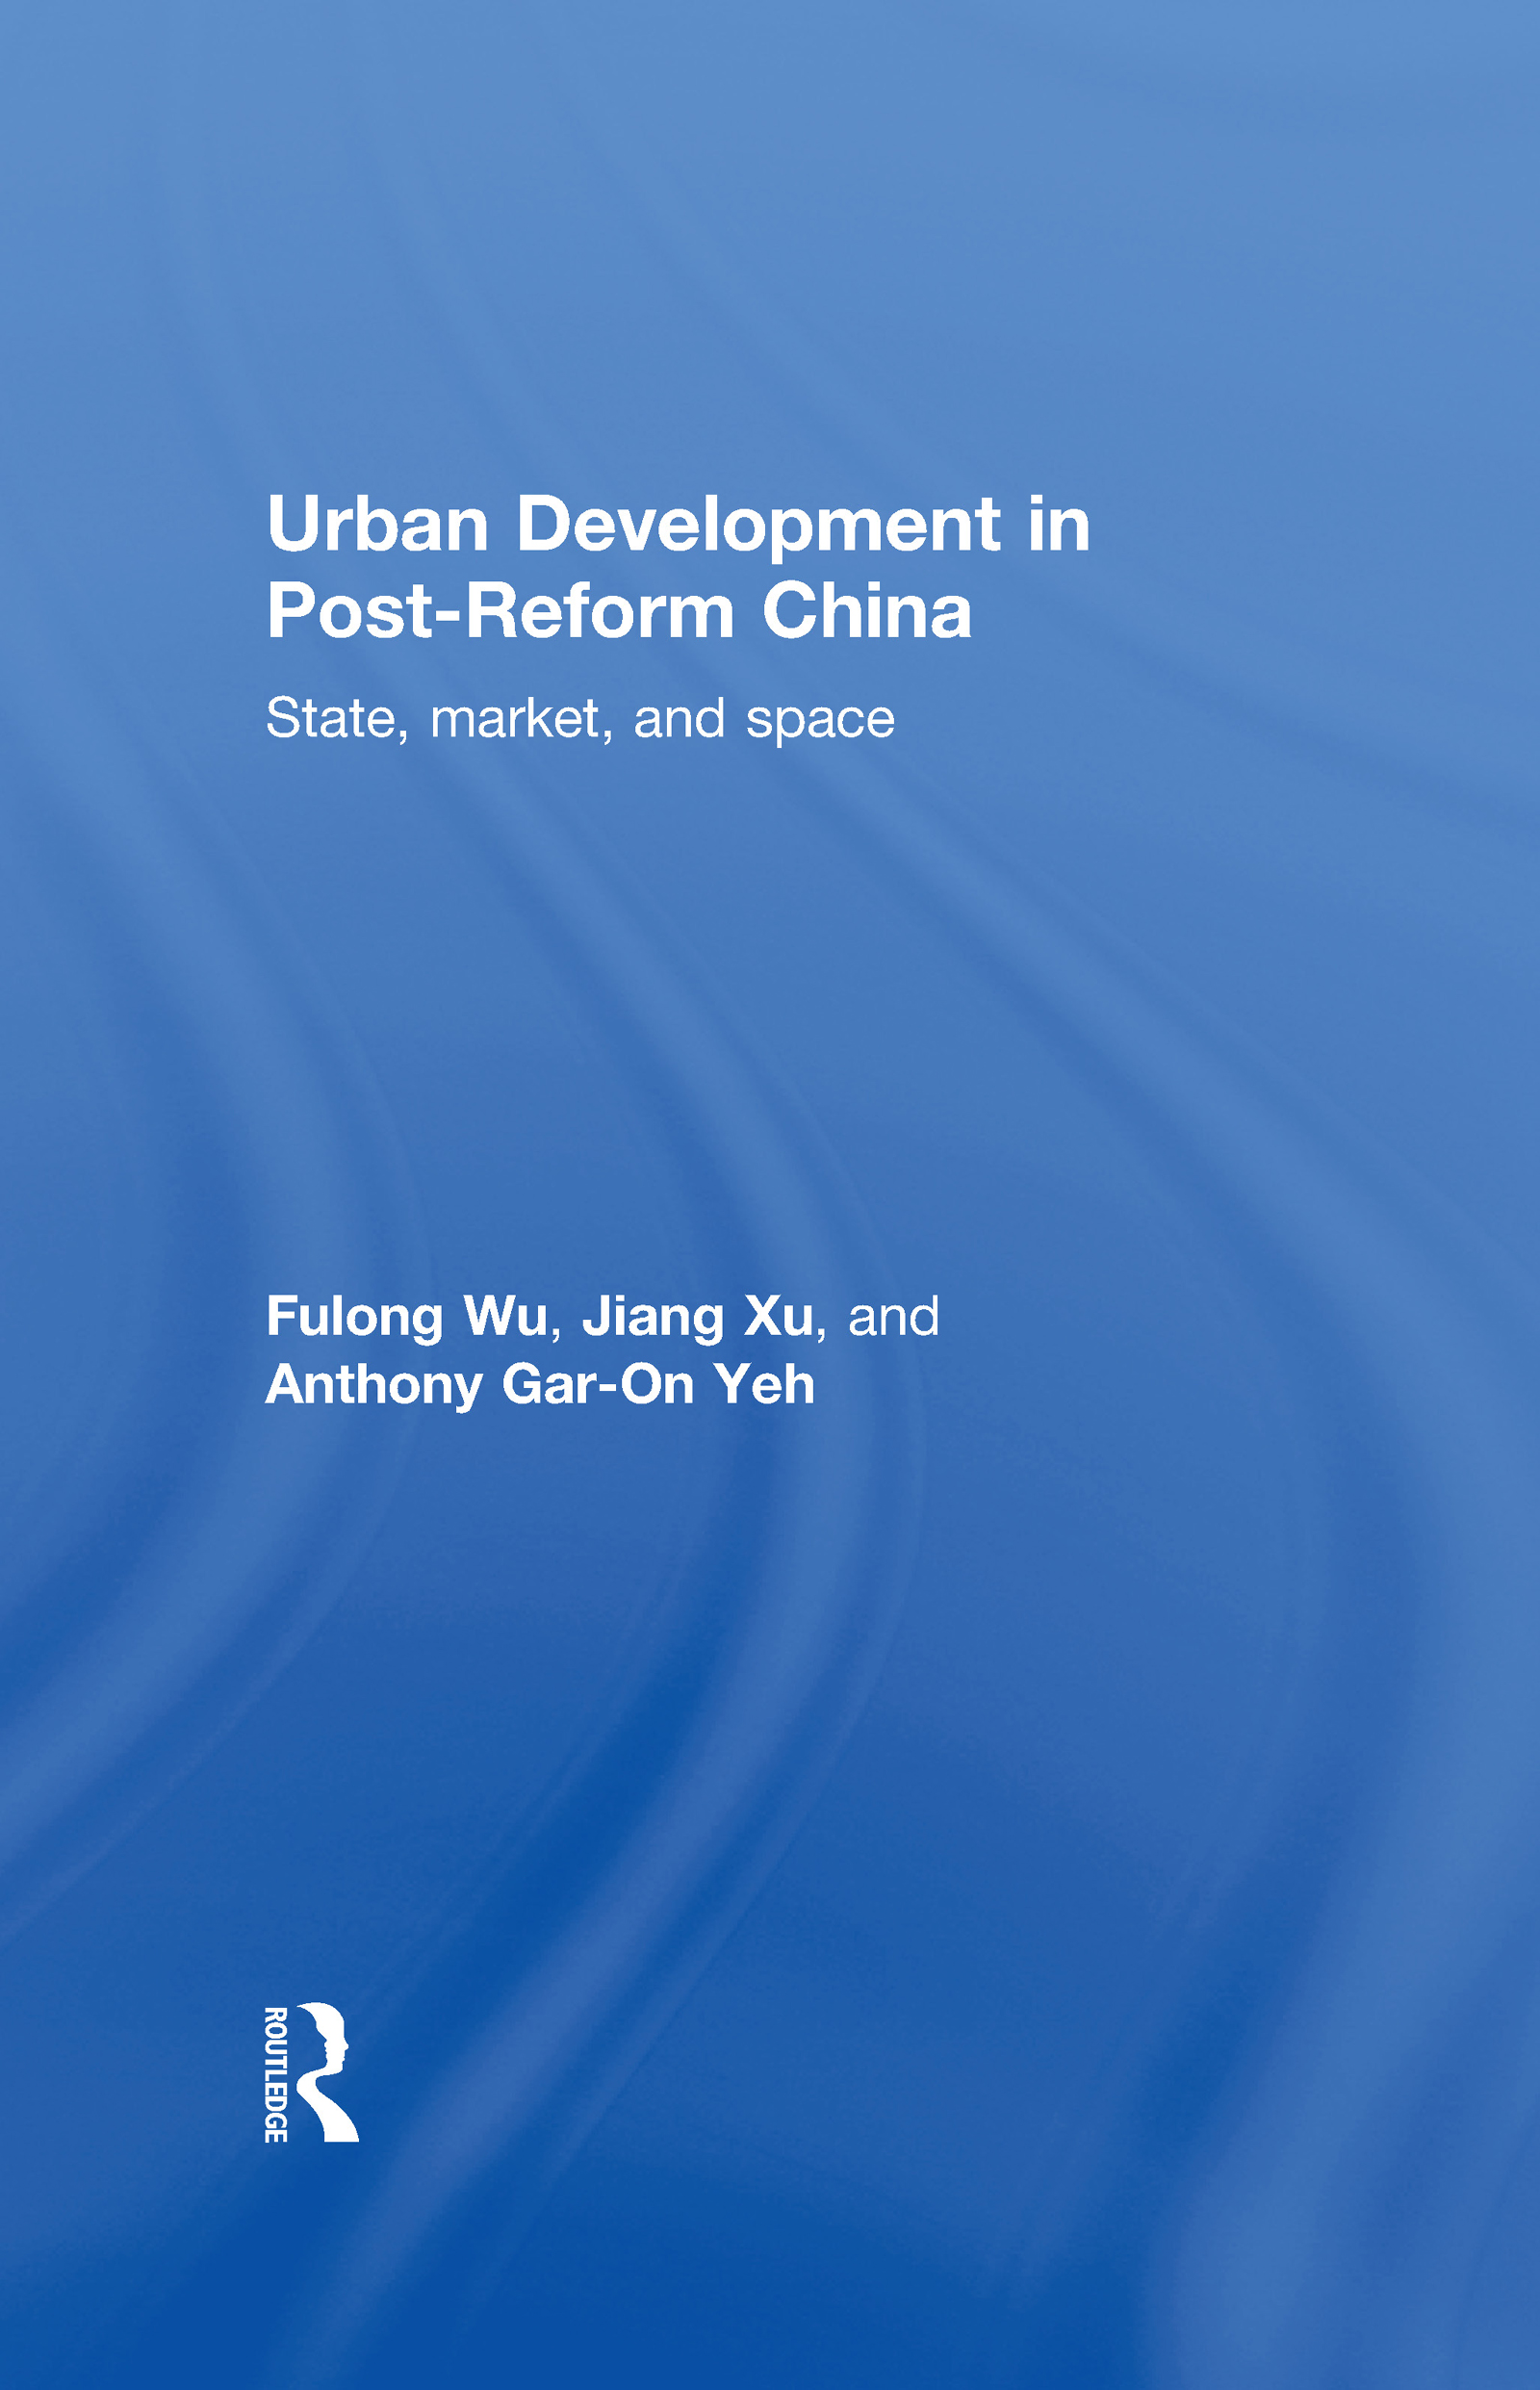 Urban Development in Post-Reform China